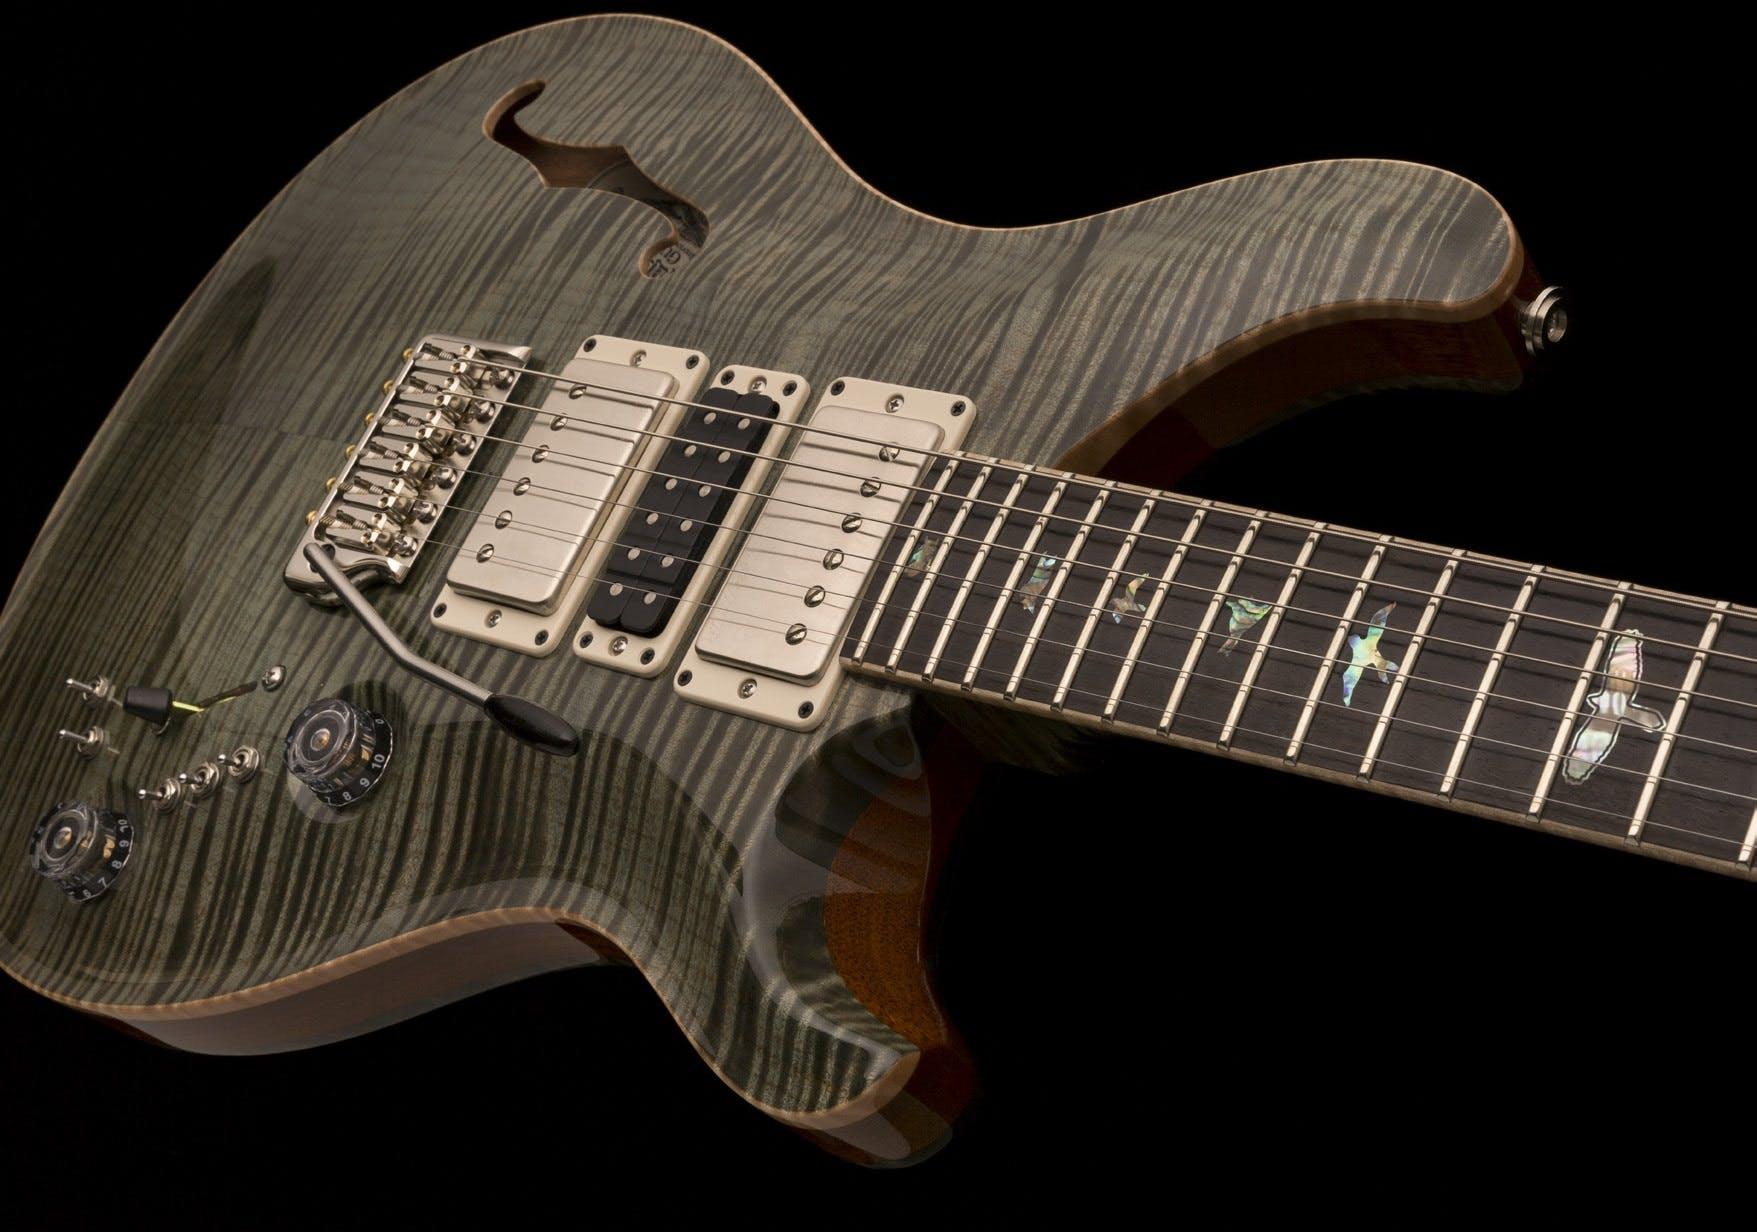 Prs Se Schematics Electrical Wiring Diagrams Diagram For Custom 24 Paul Allender Schematic Guitar